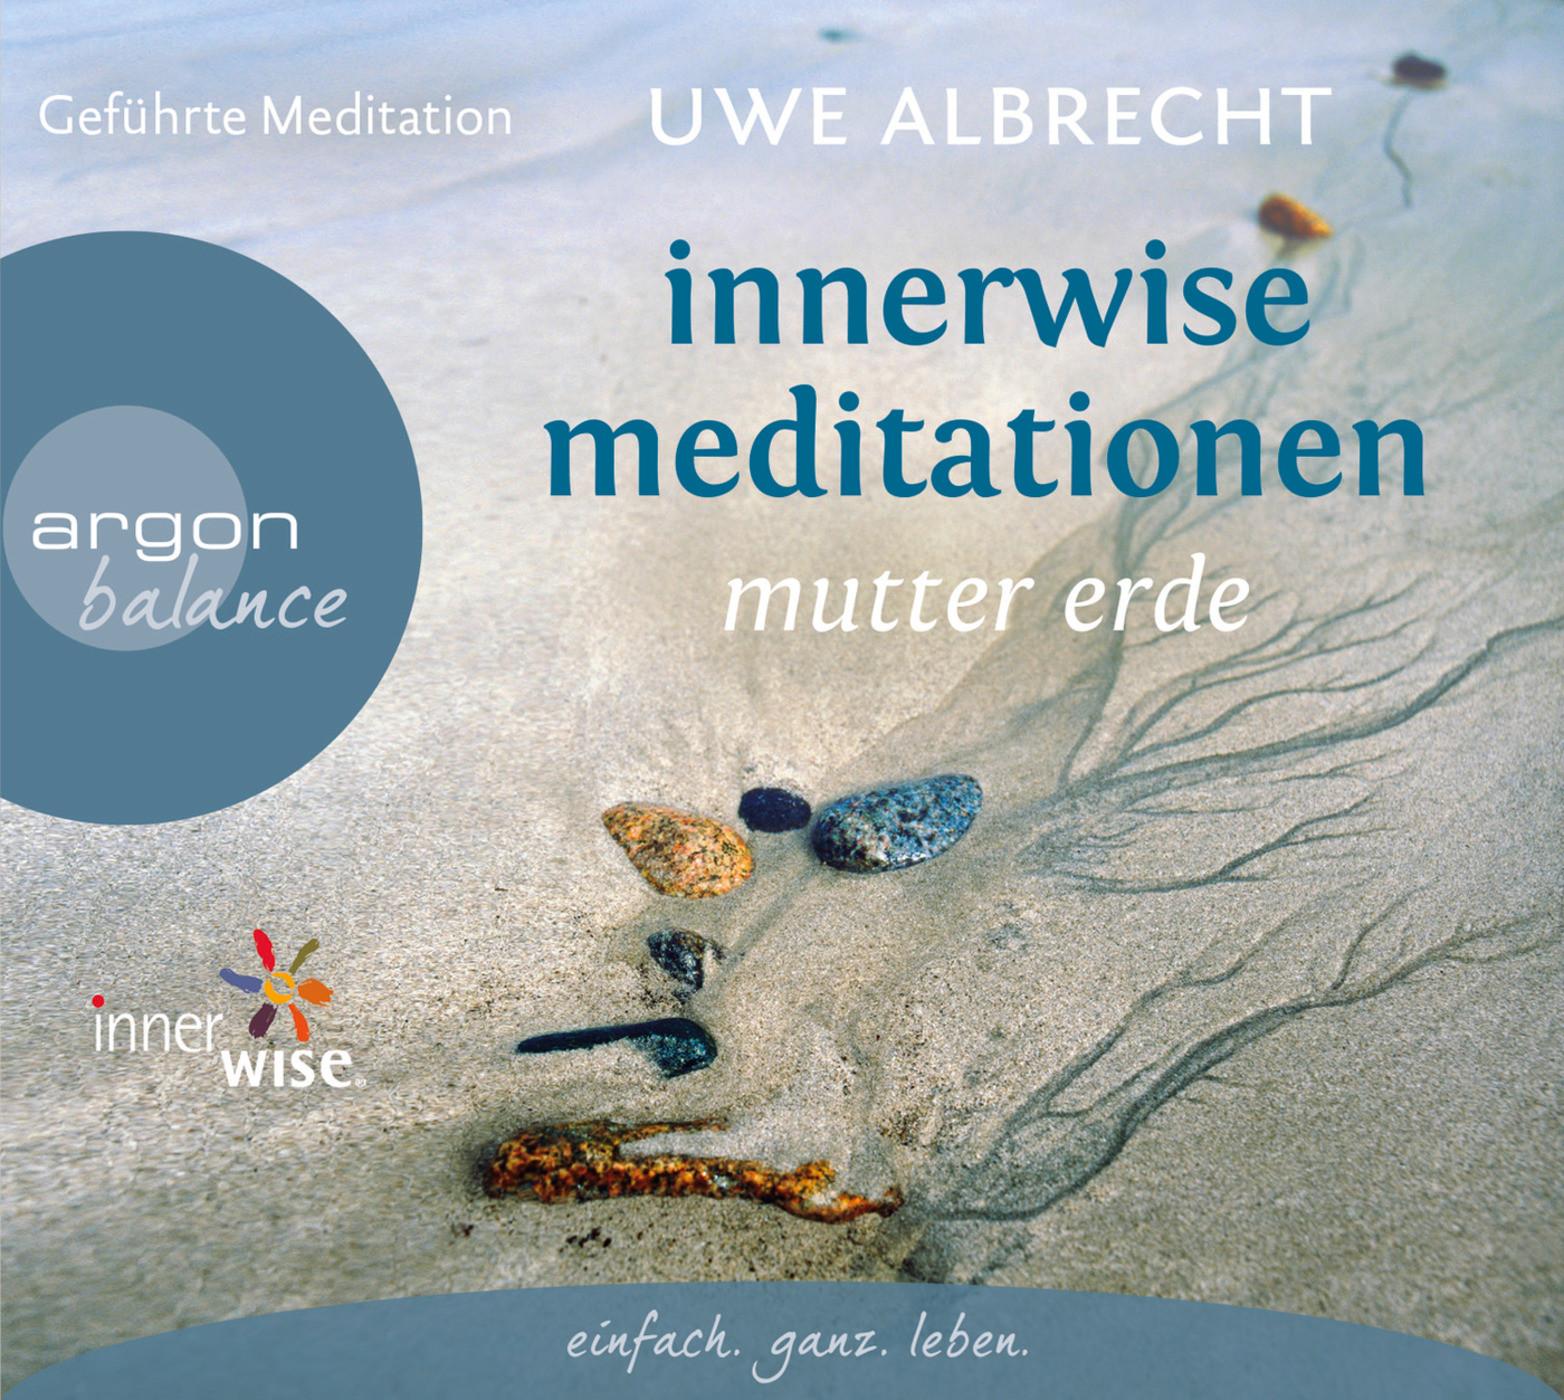 Uwe Albrecht - Innerwise Meditation: Mutter Erde